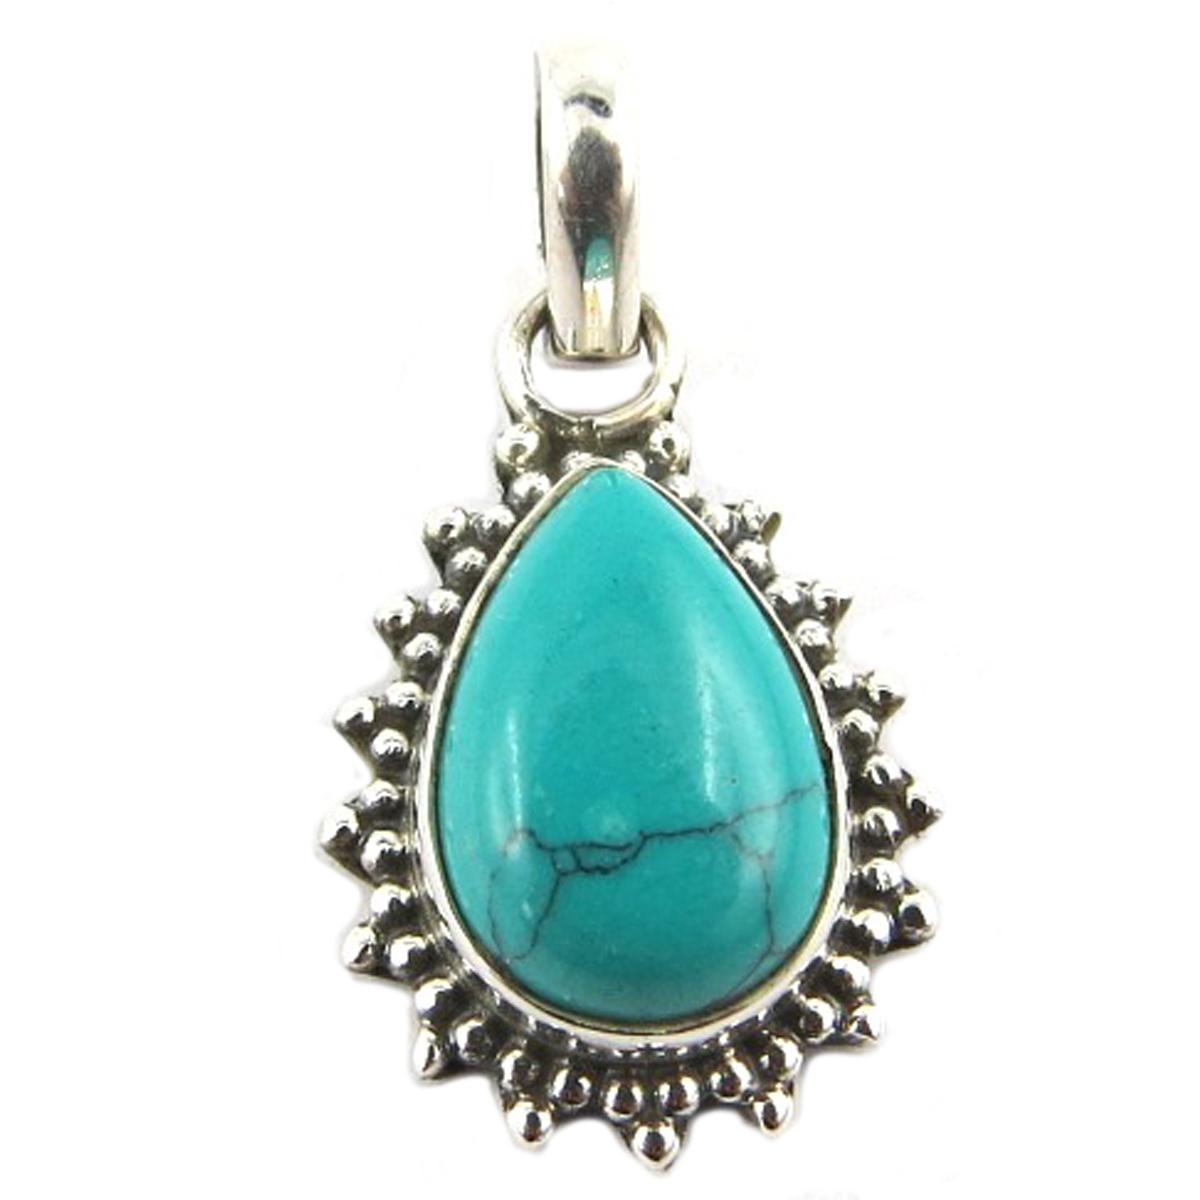 Pendentif Argent artisanal \'Heaven\' turquoise - 16x13 mm - [Q9865]